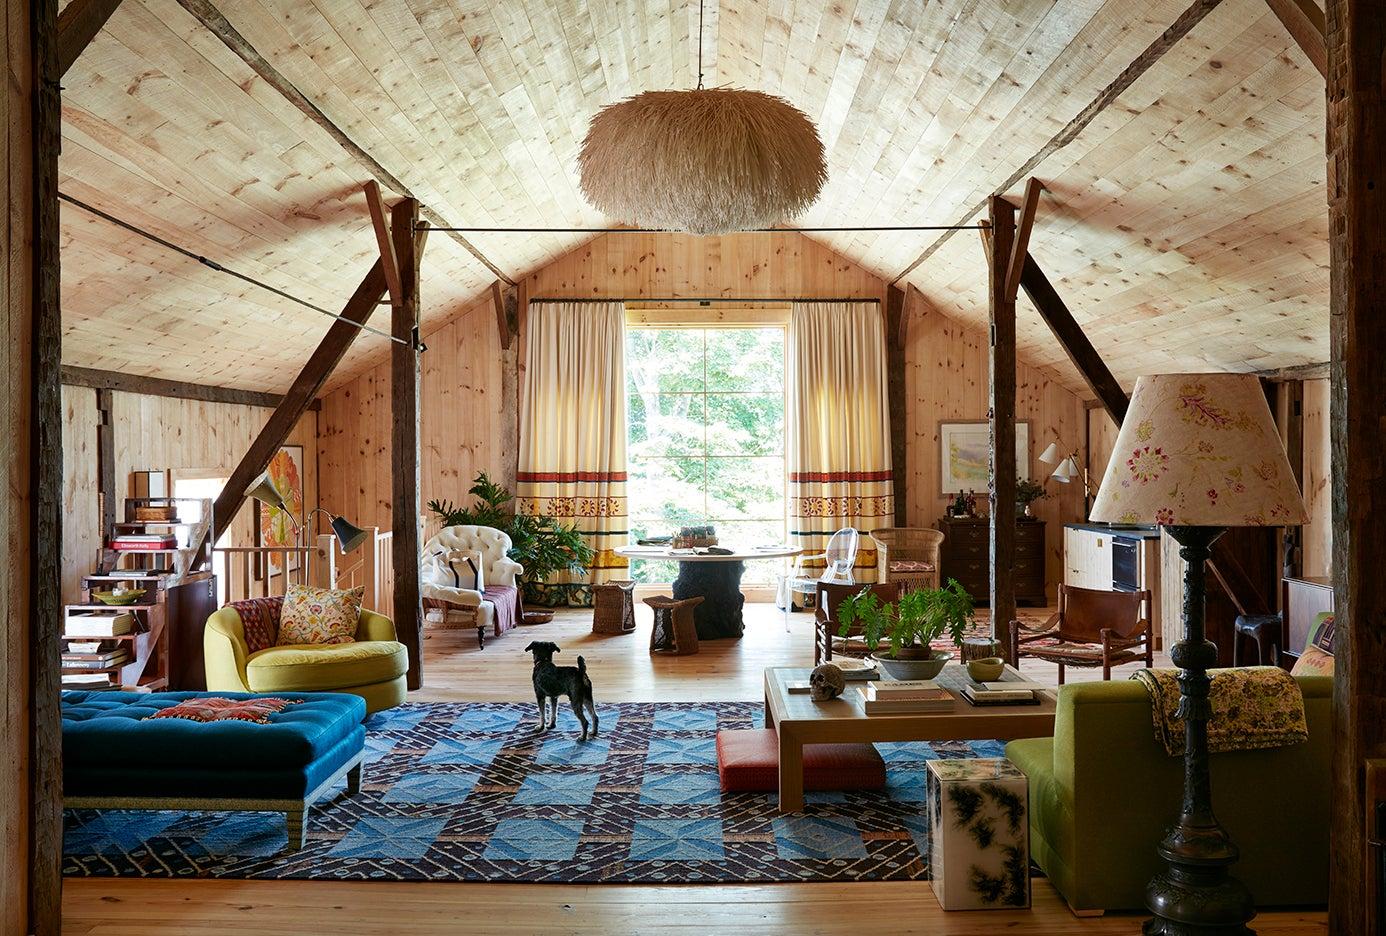 Wood-paneled room with blue Swedish rug